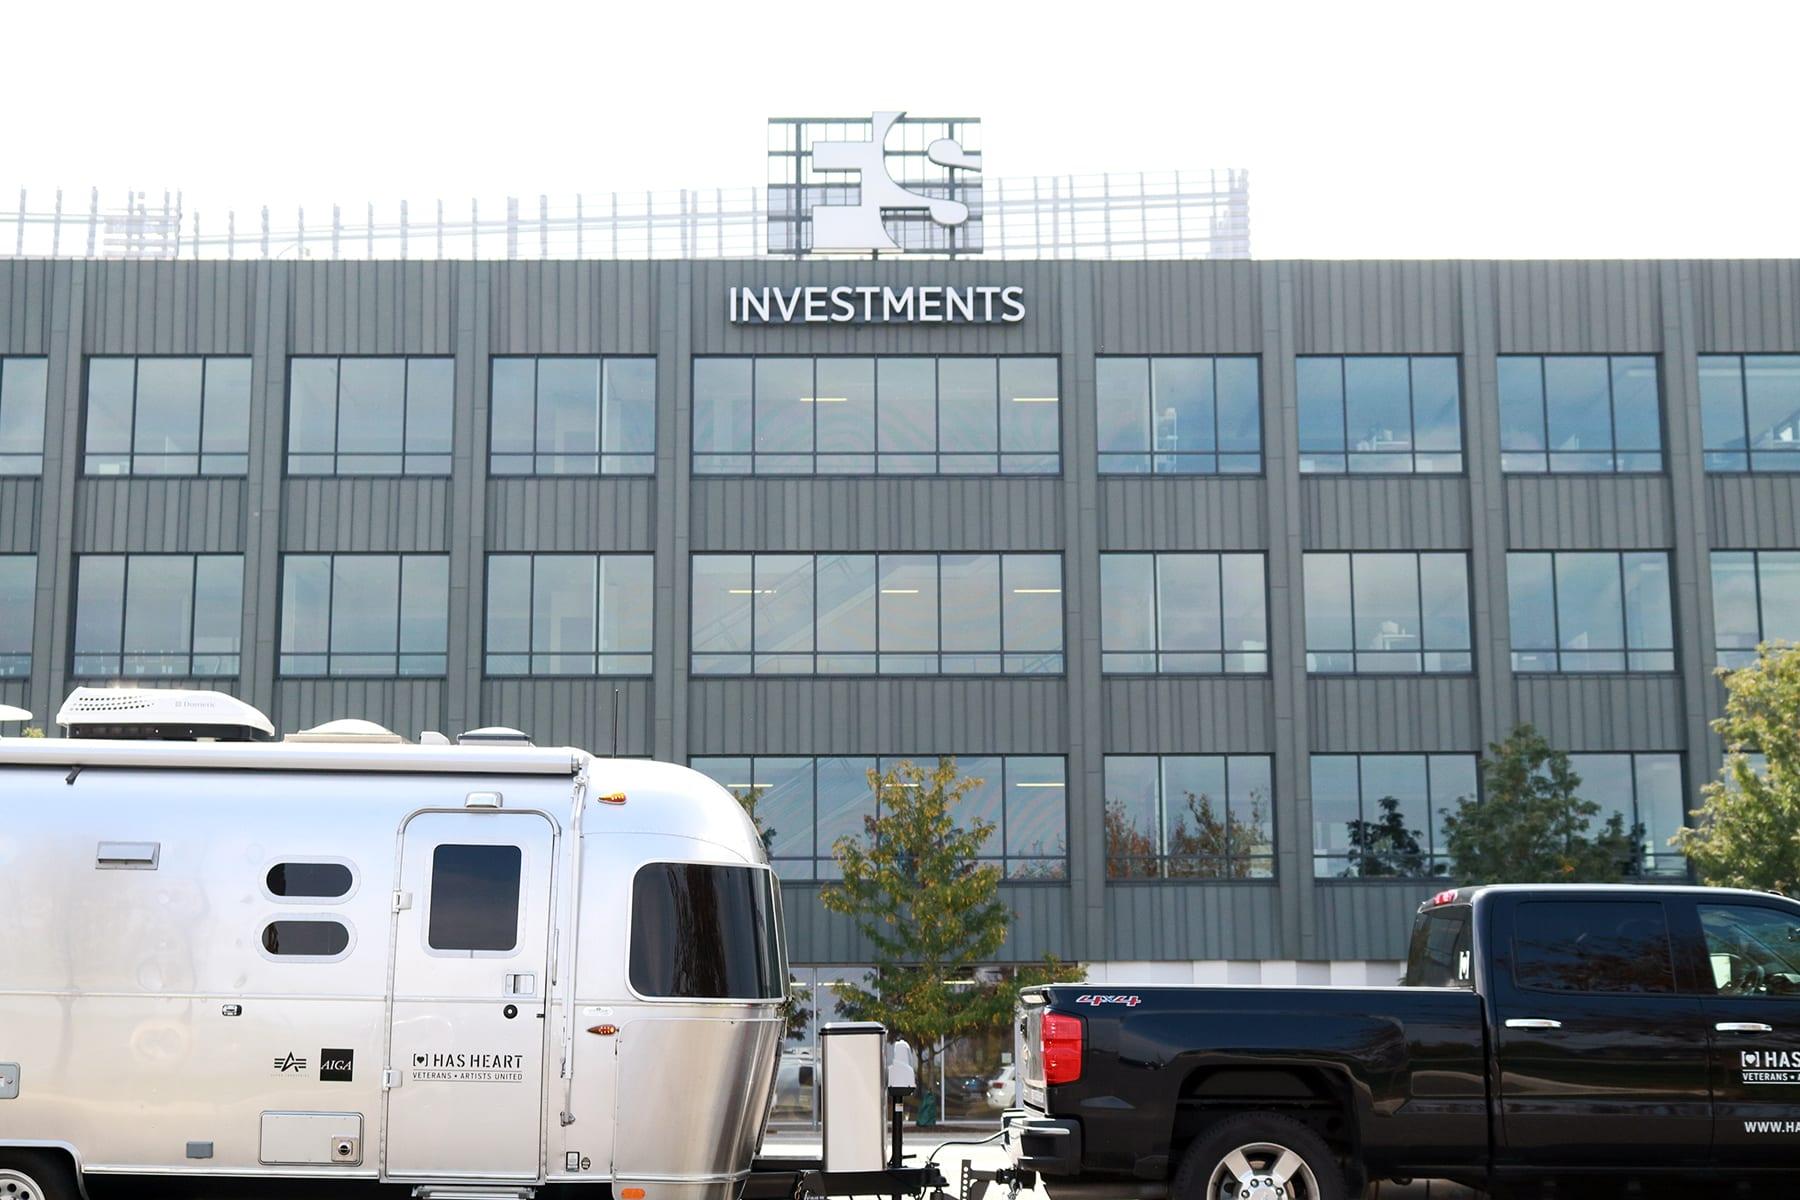 06-PA-journey03-fsinvestments-trailer01.jpg